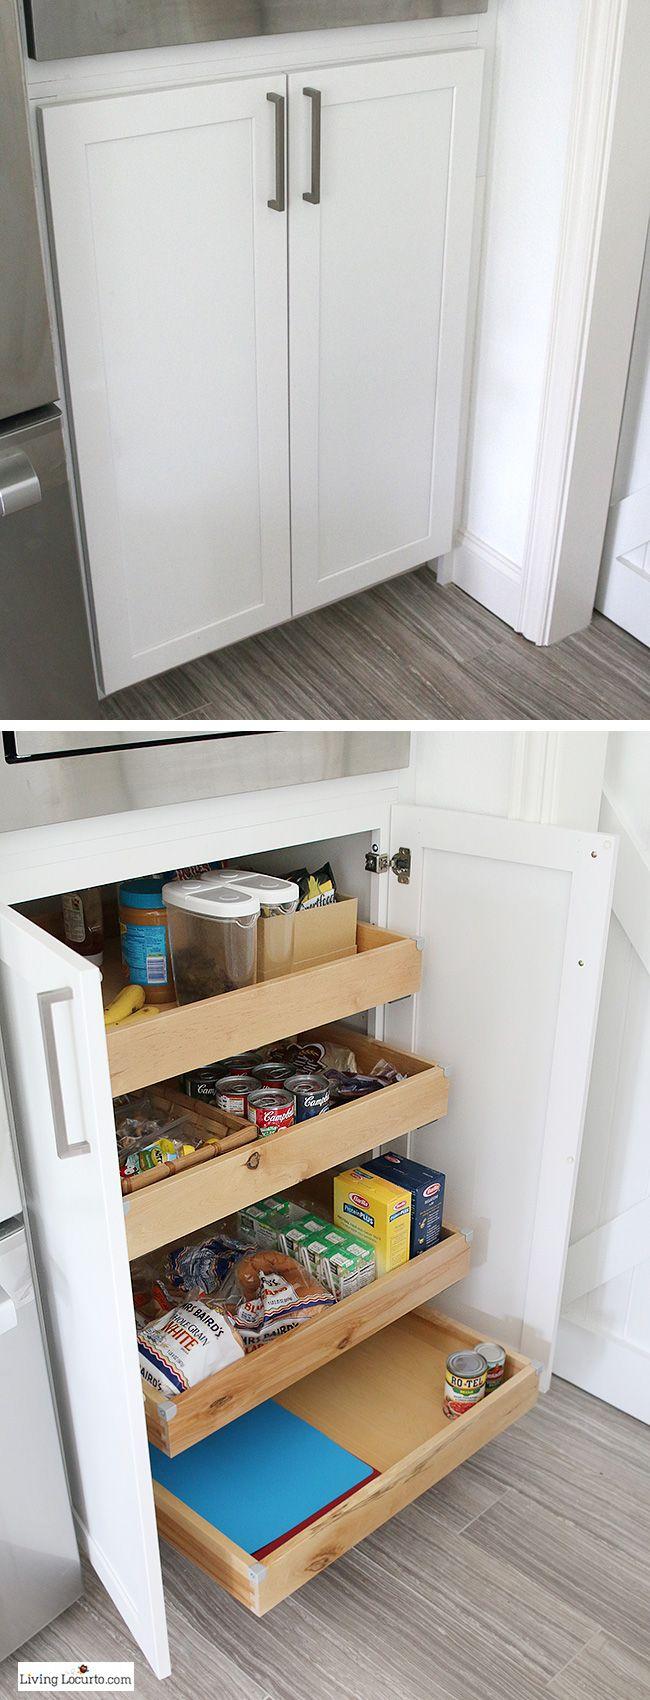 587 best For The Kitchen images on Pinterest | Kitchen, Kitchen ...